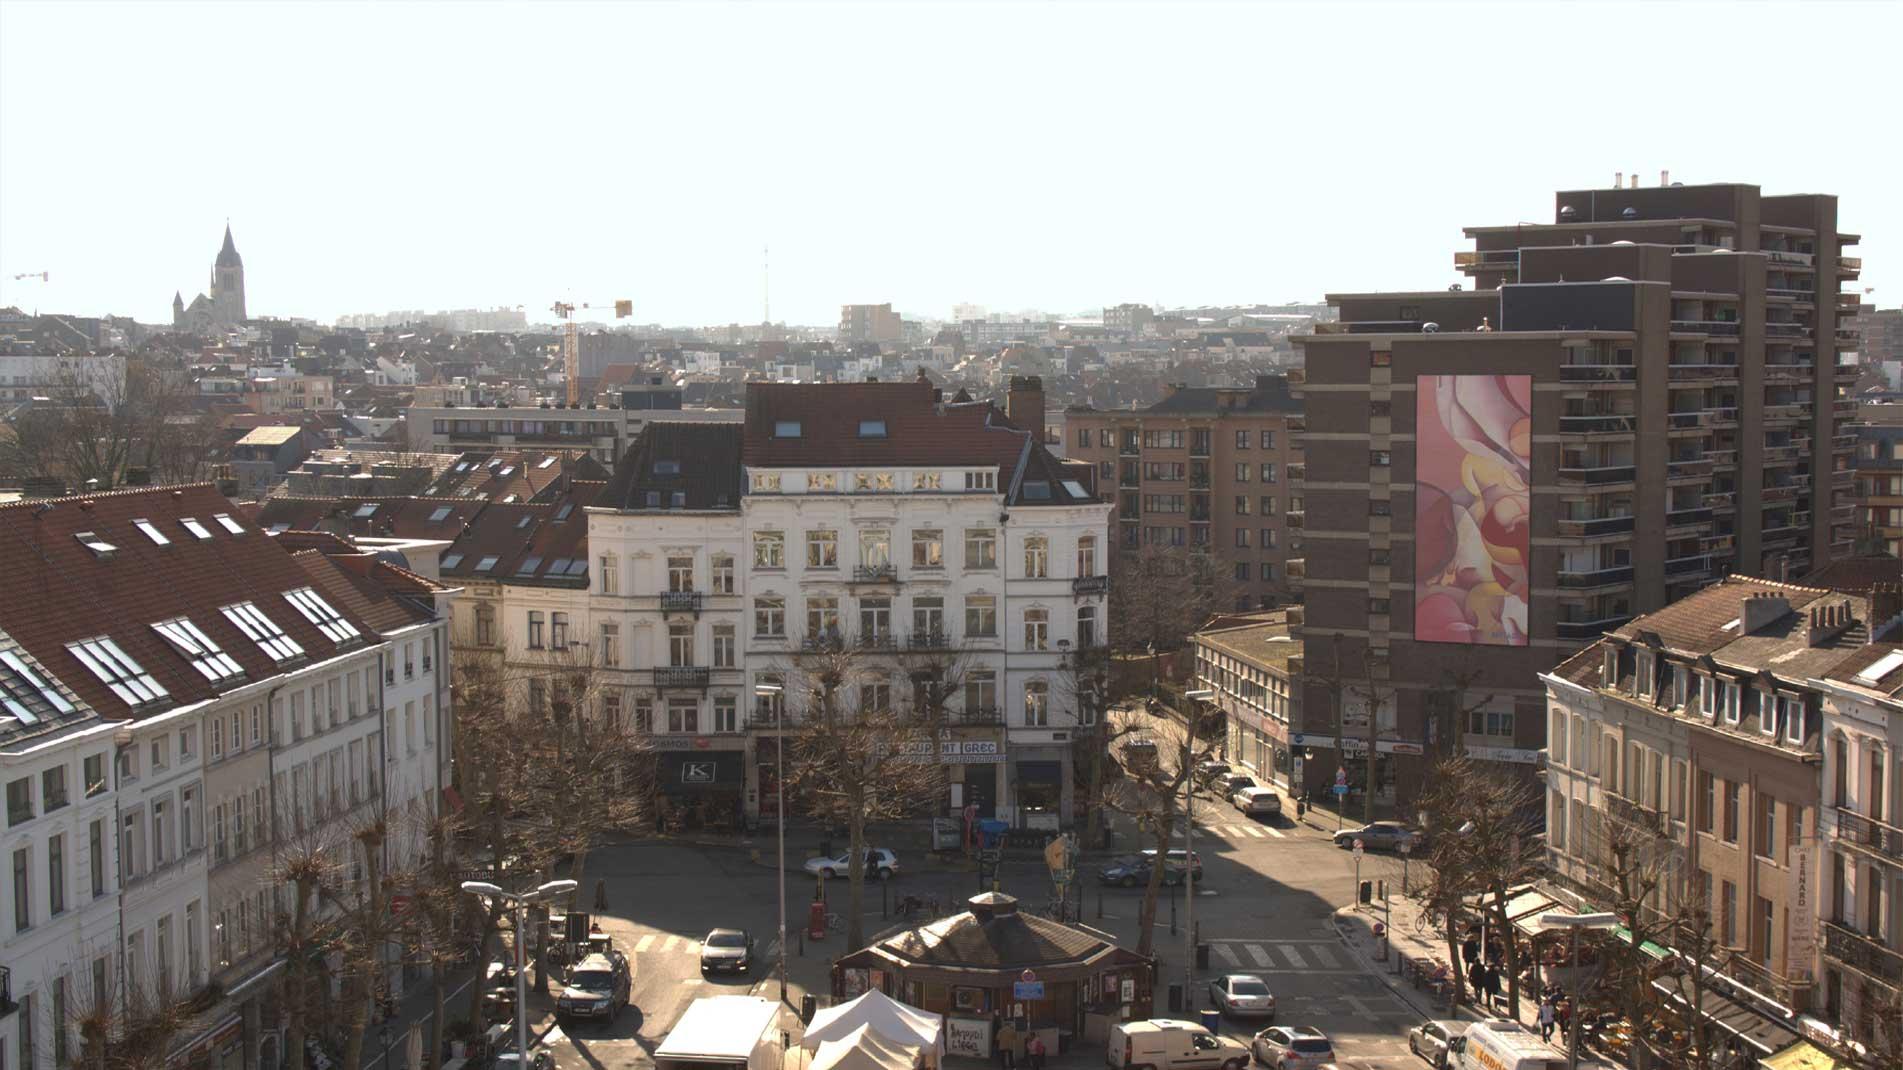 Bottazzi public art in Brussels, monumental painting